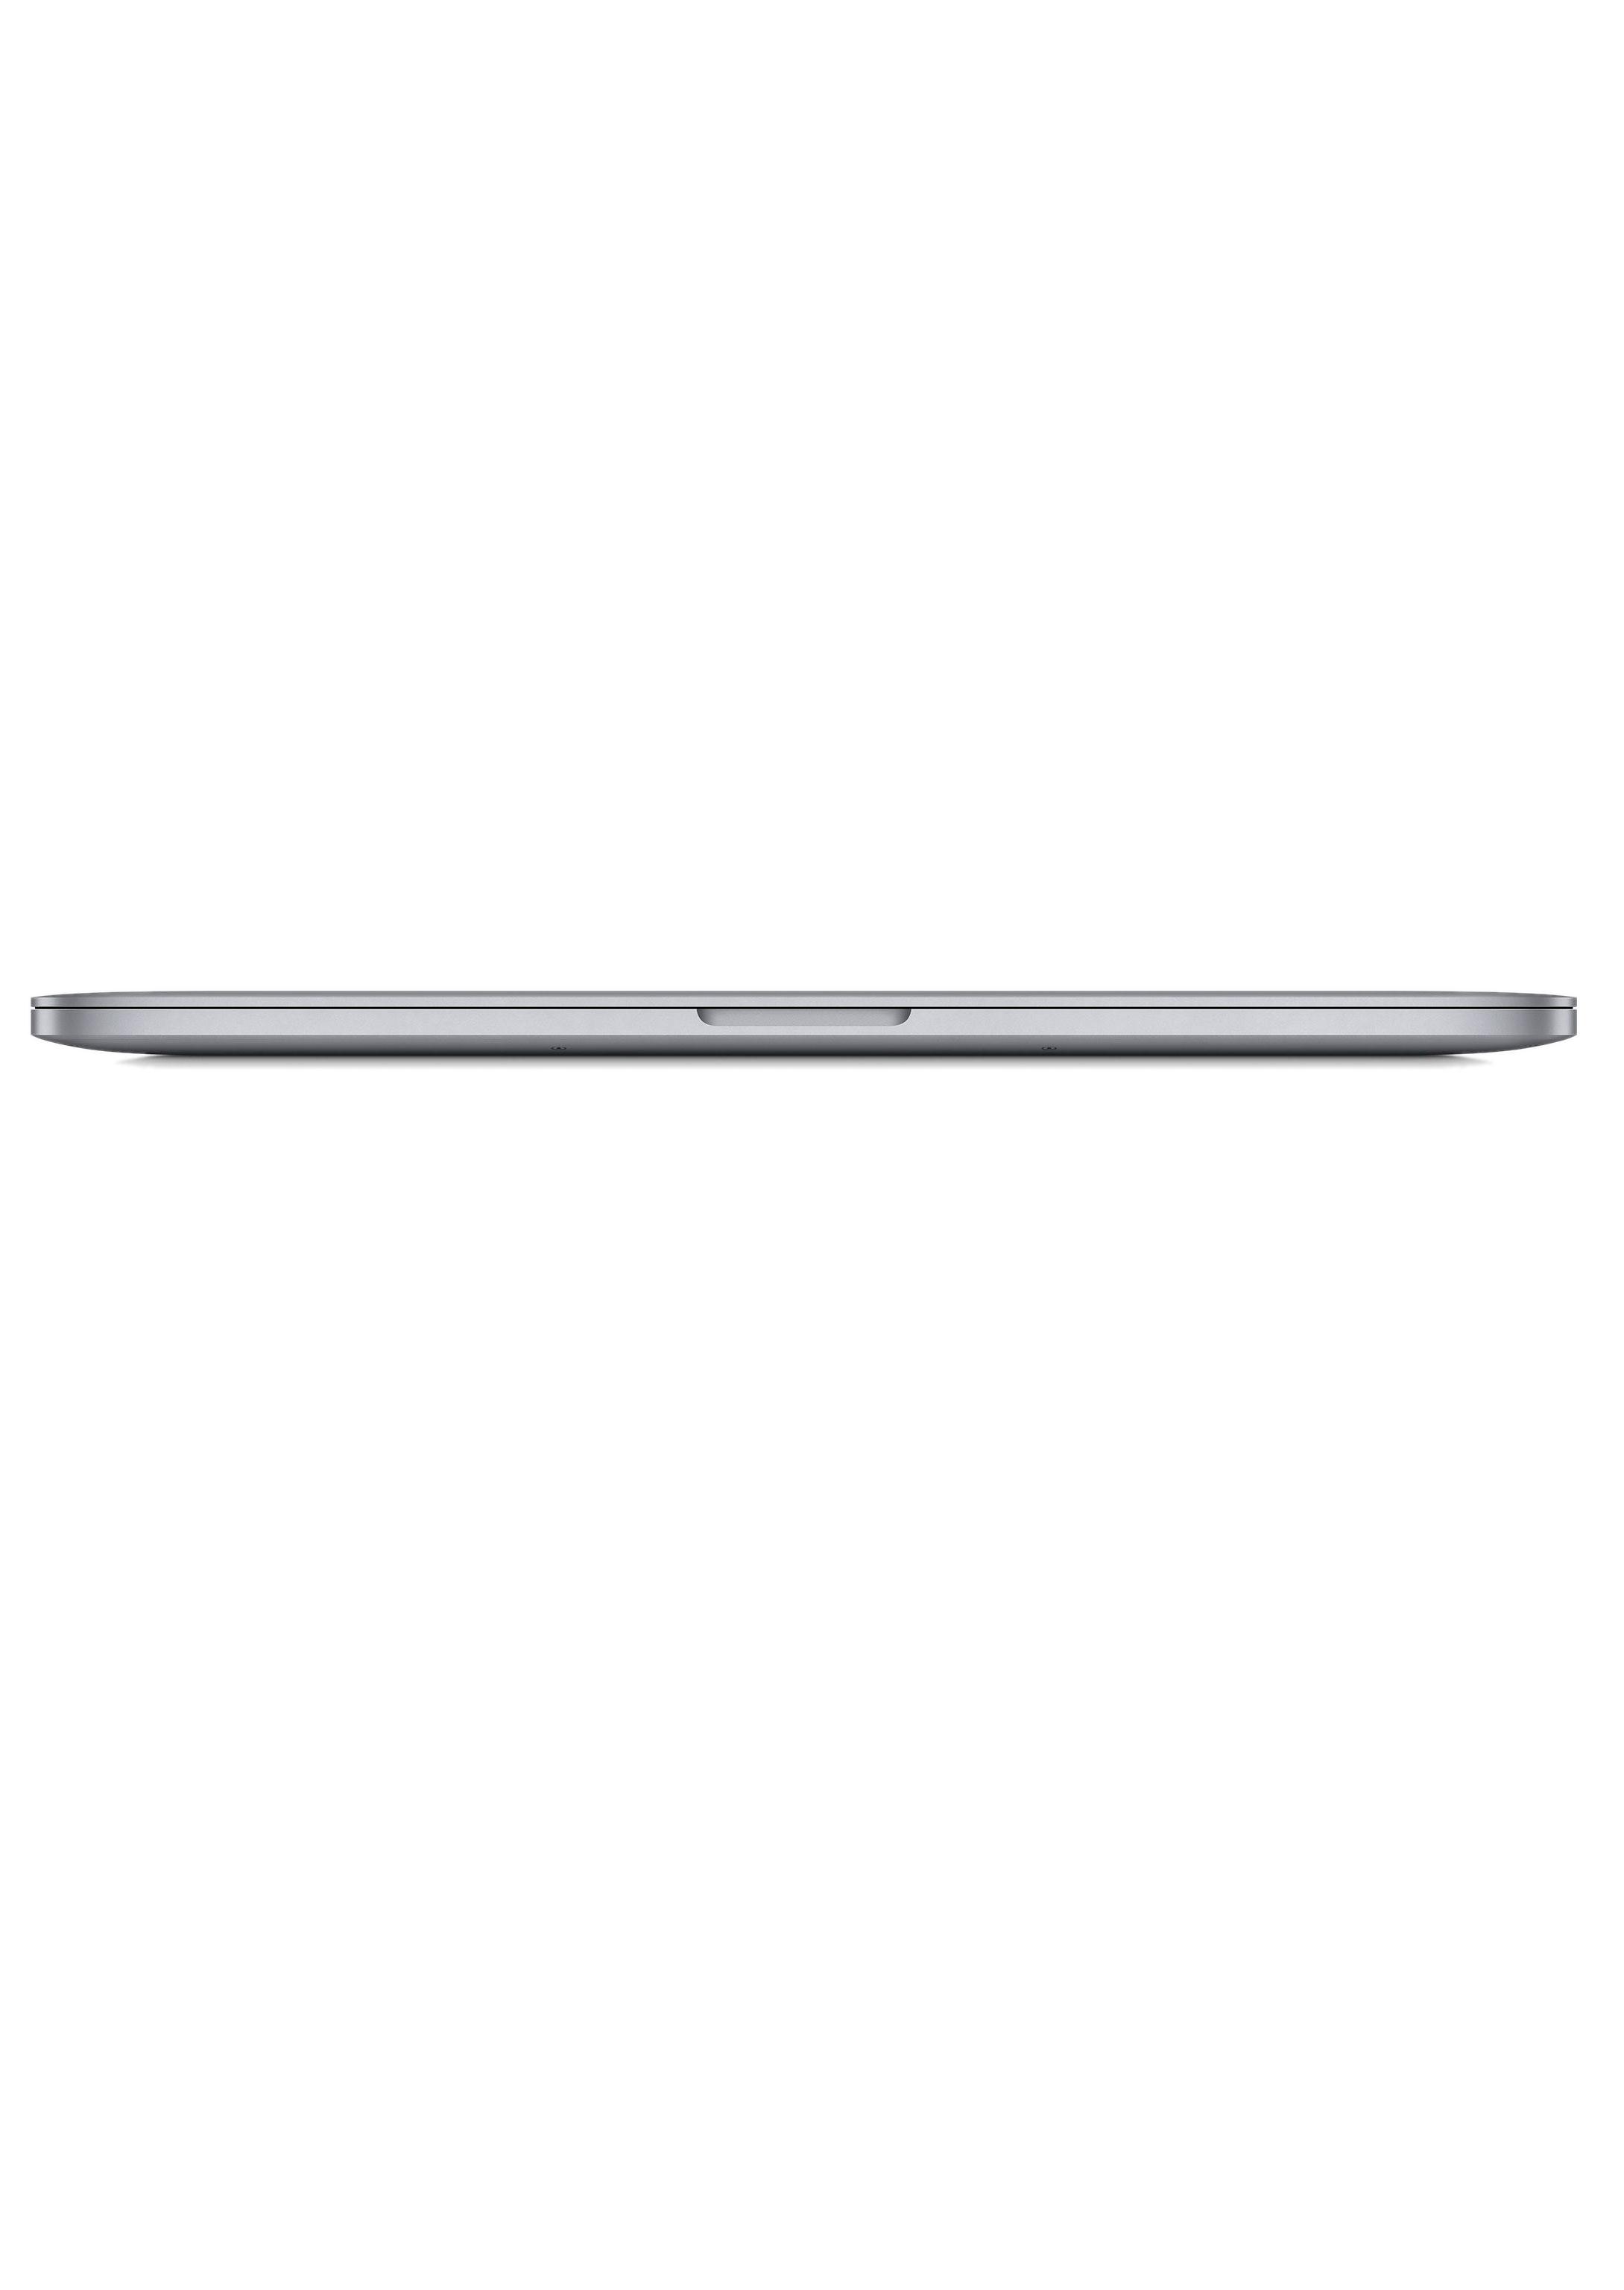 16-inch MacBook Pro: 2,3‑GHz 8‑core i9-processor - 1 TB SSD - 16 GB RAM - AMD Radeon Pro 5500M - Spacegrijs (Nieuw)